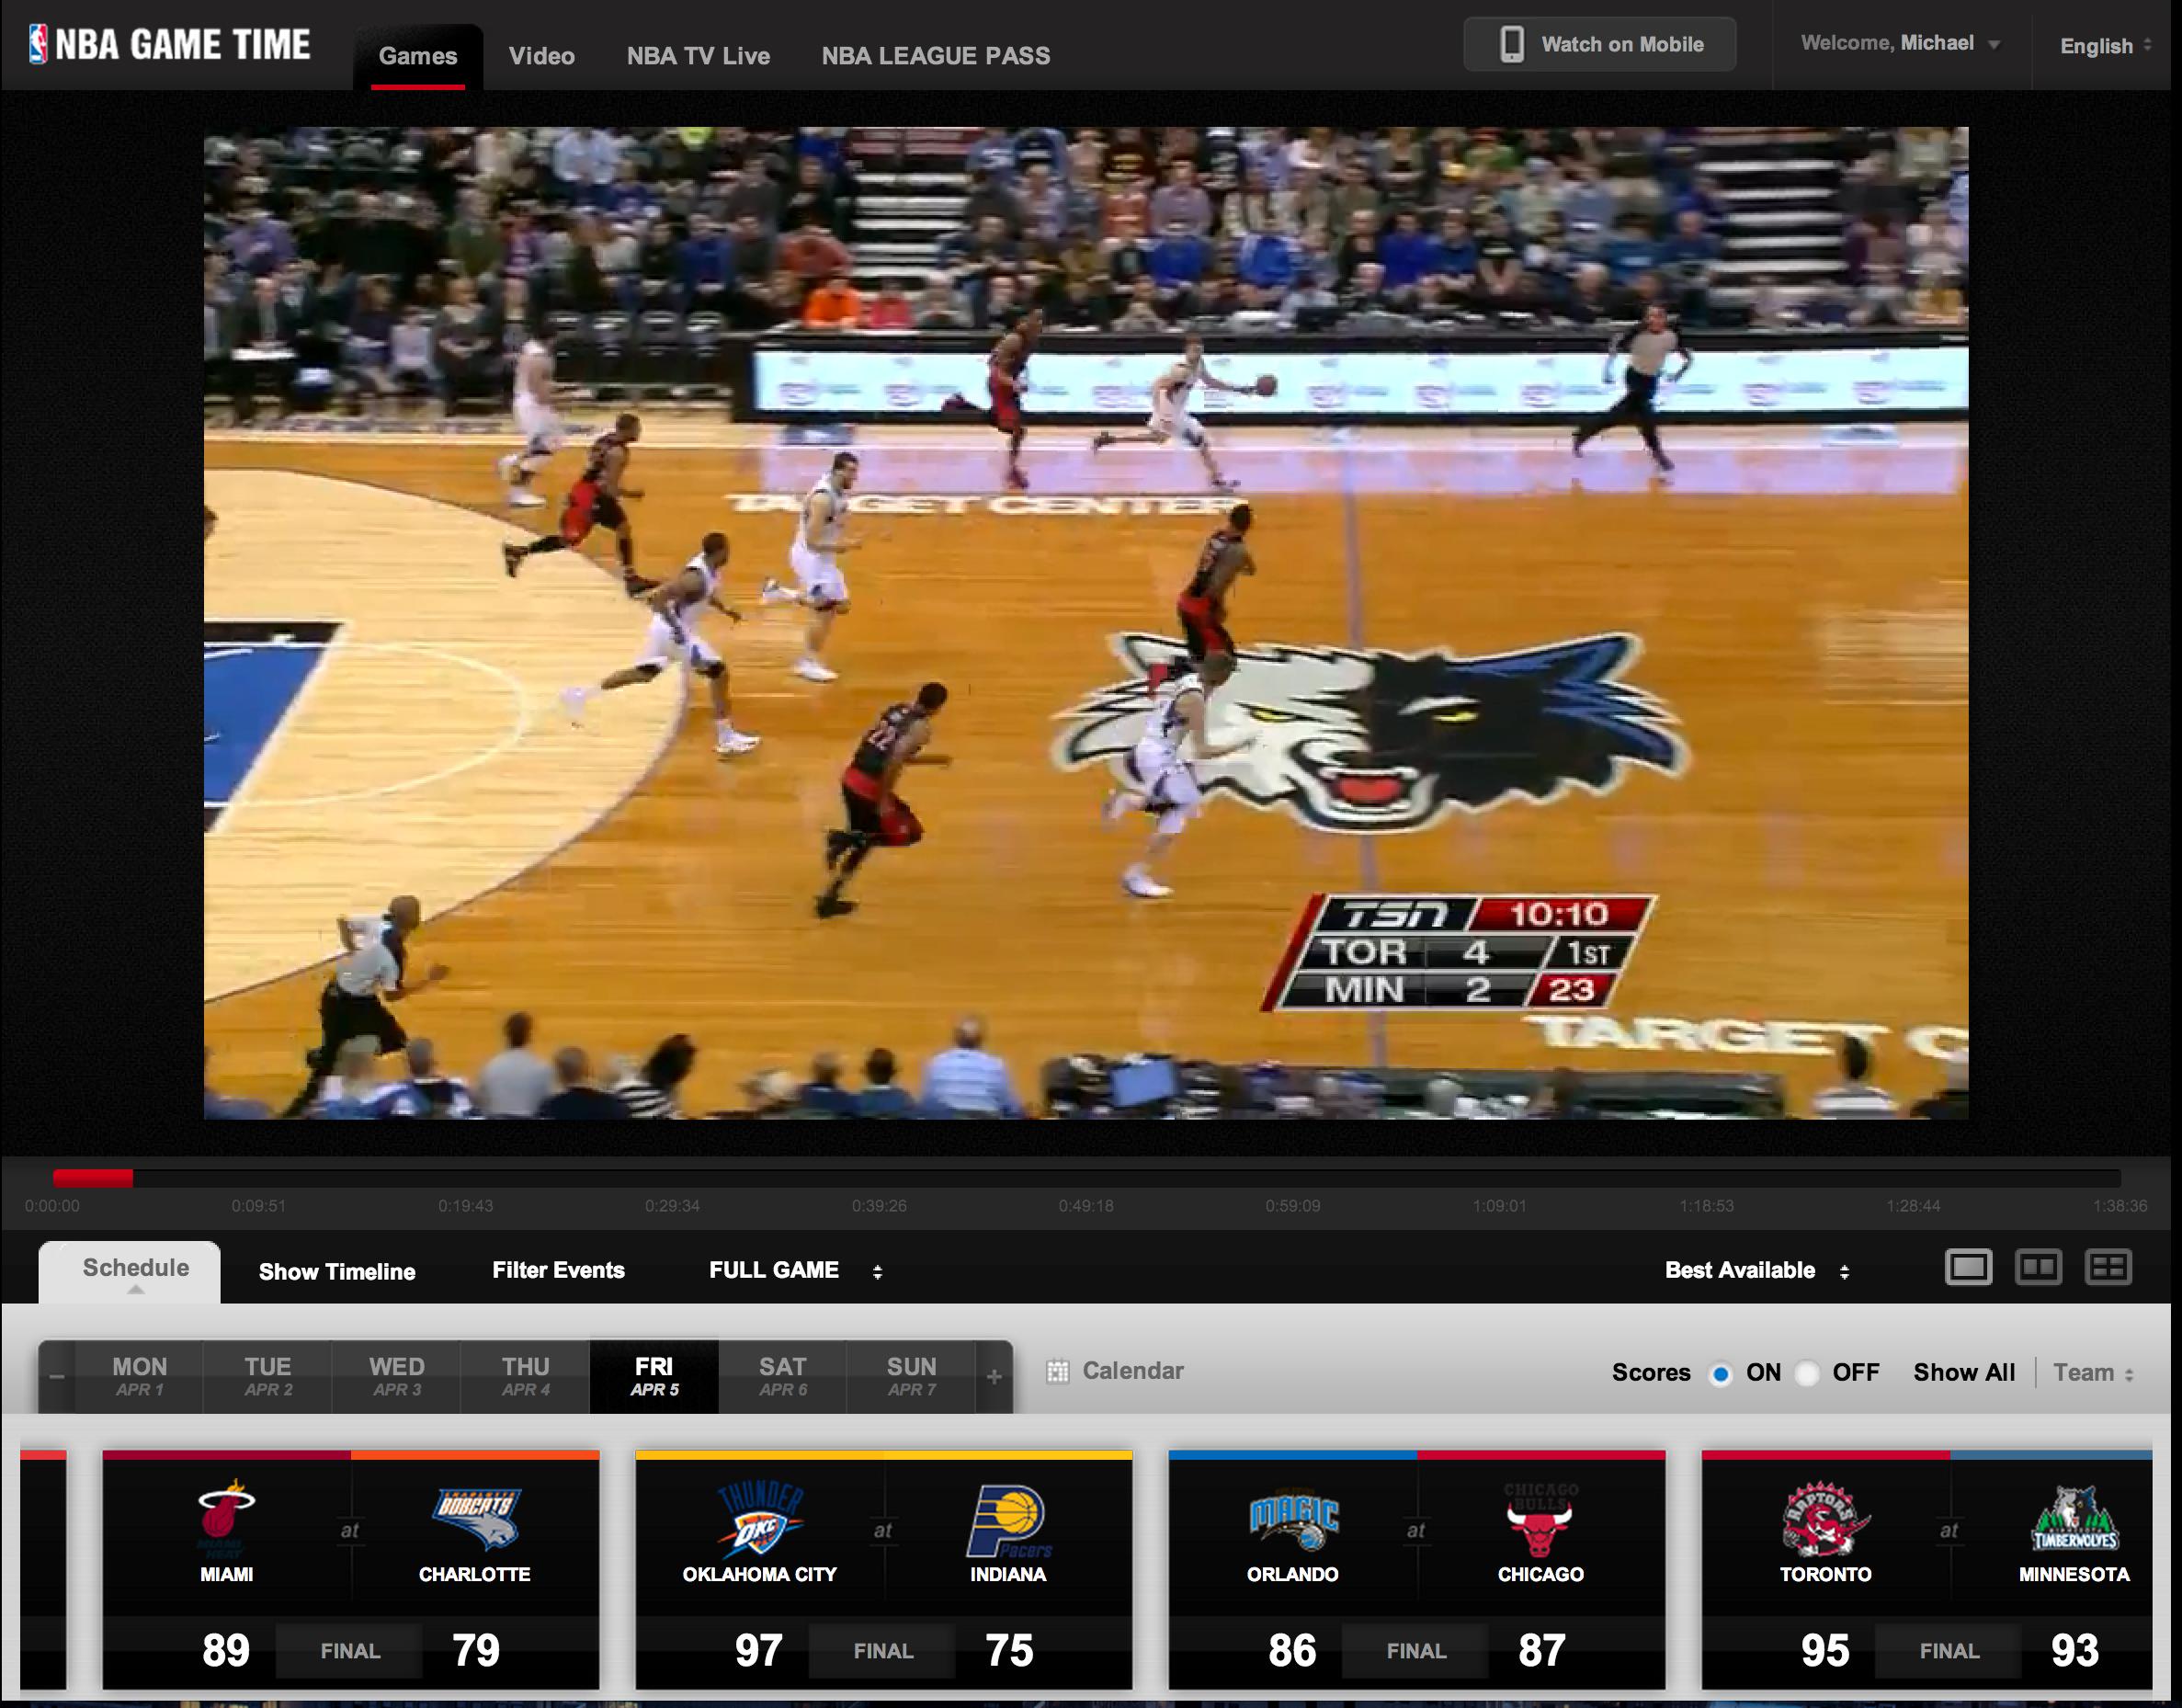 NBA Game Time - More B-Ball Than you can Handle